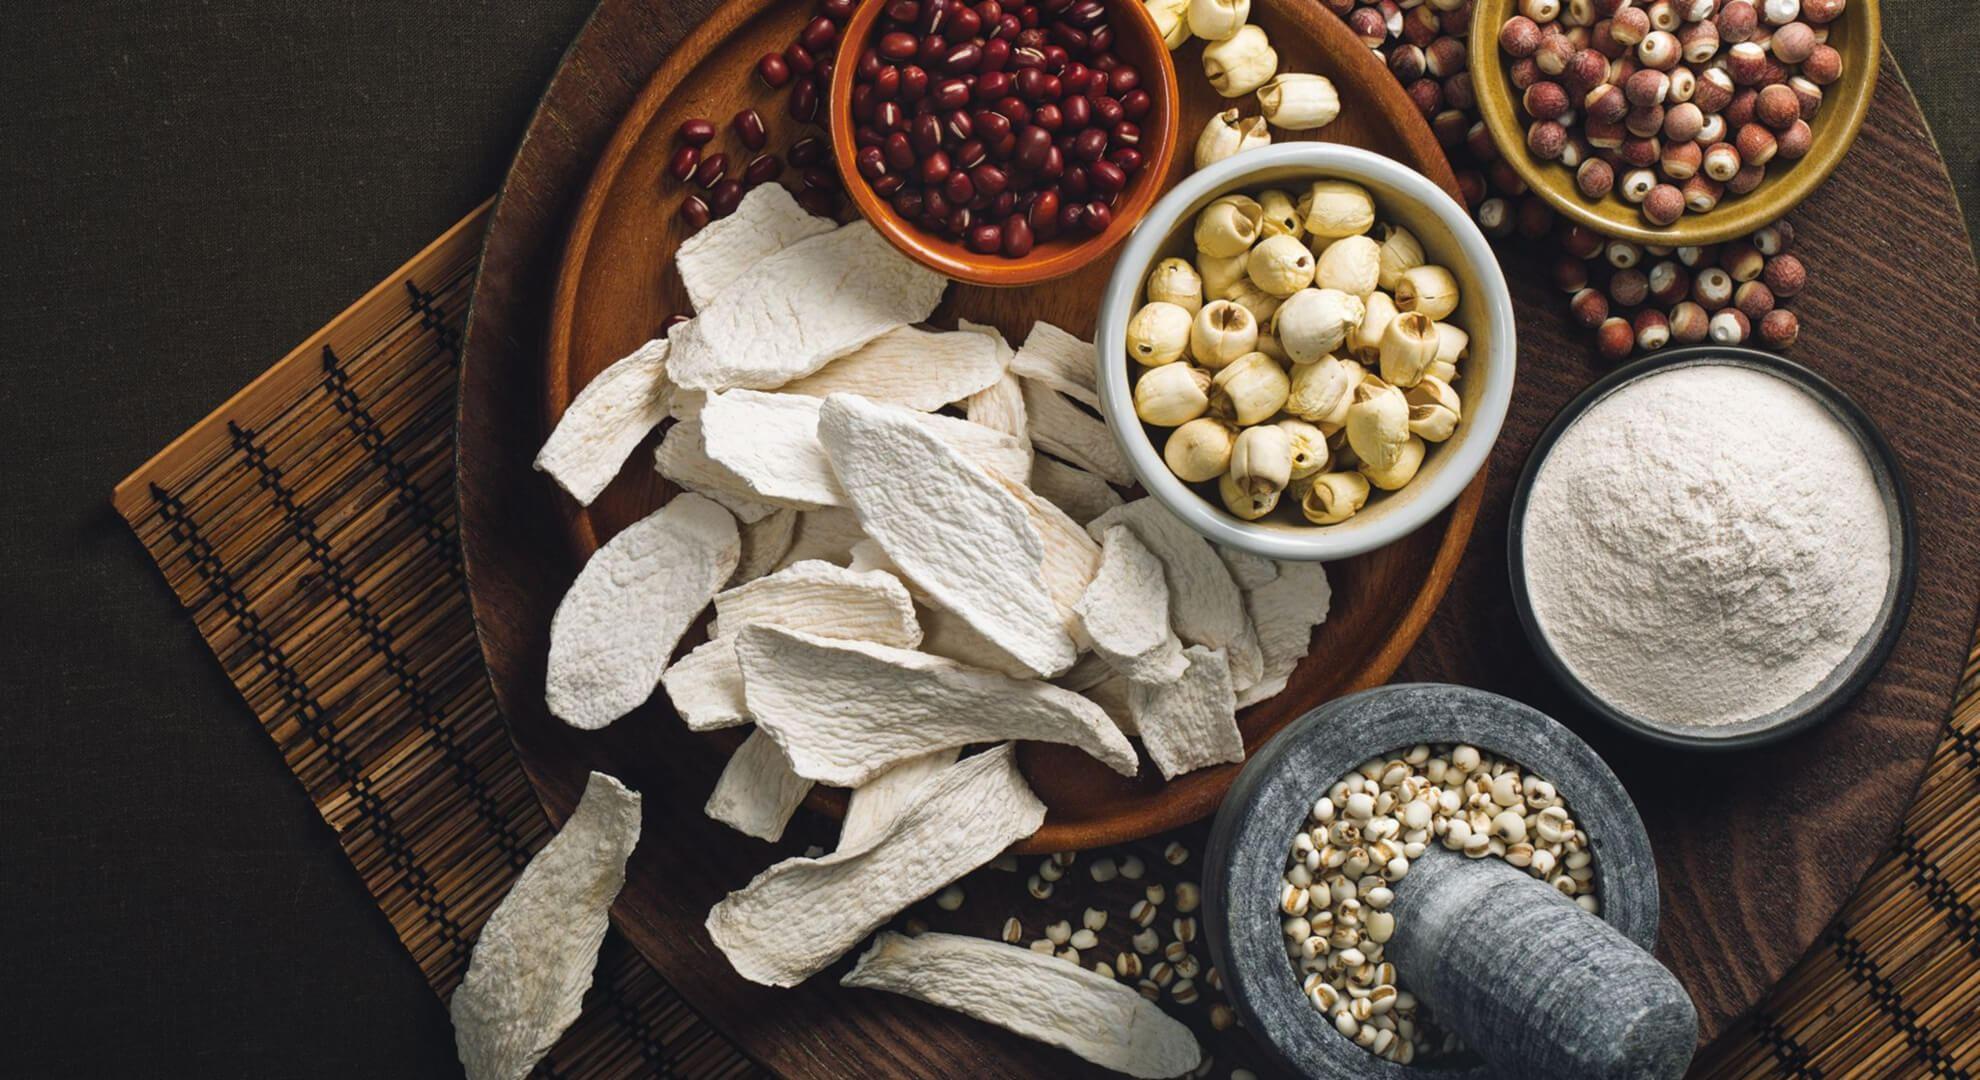 herbal medicine against insomnia